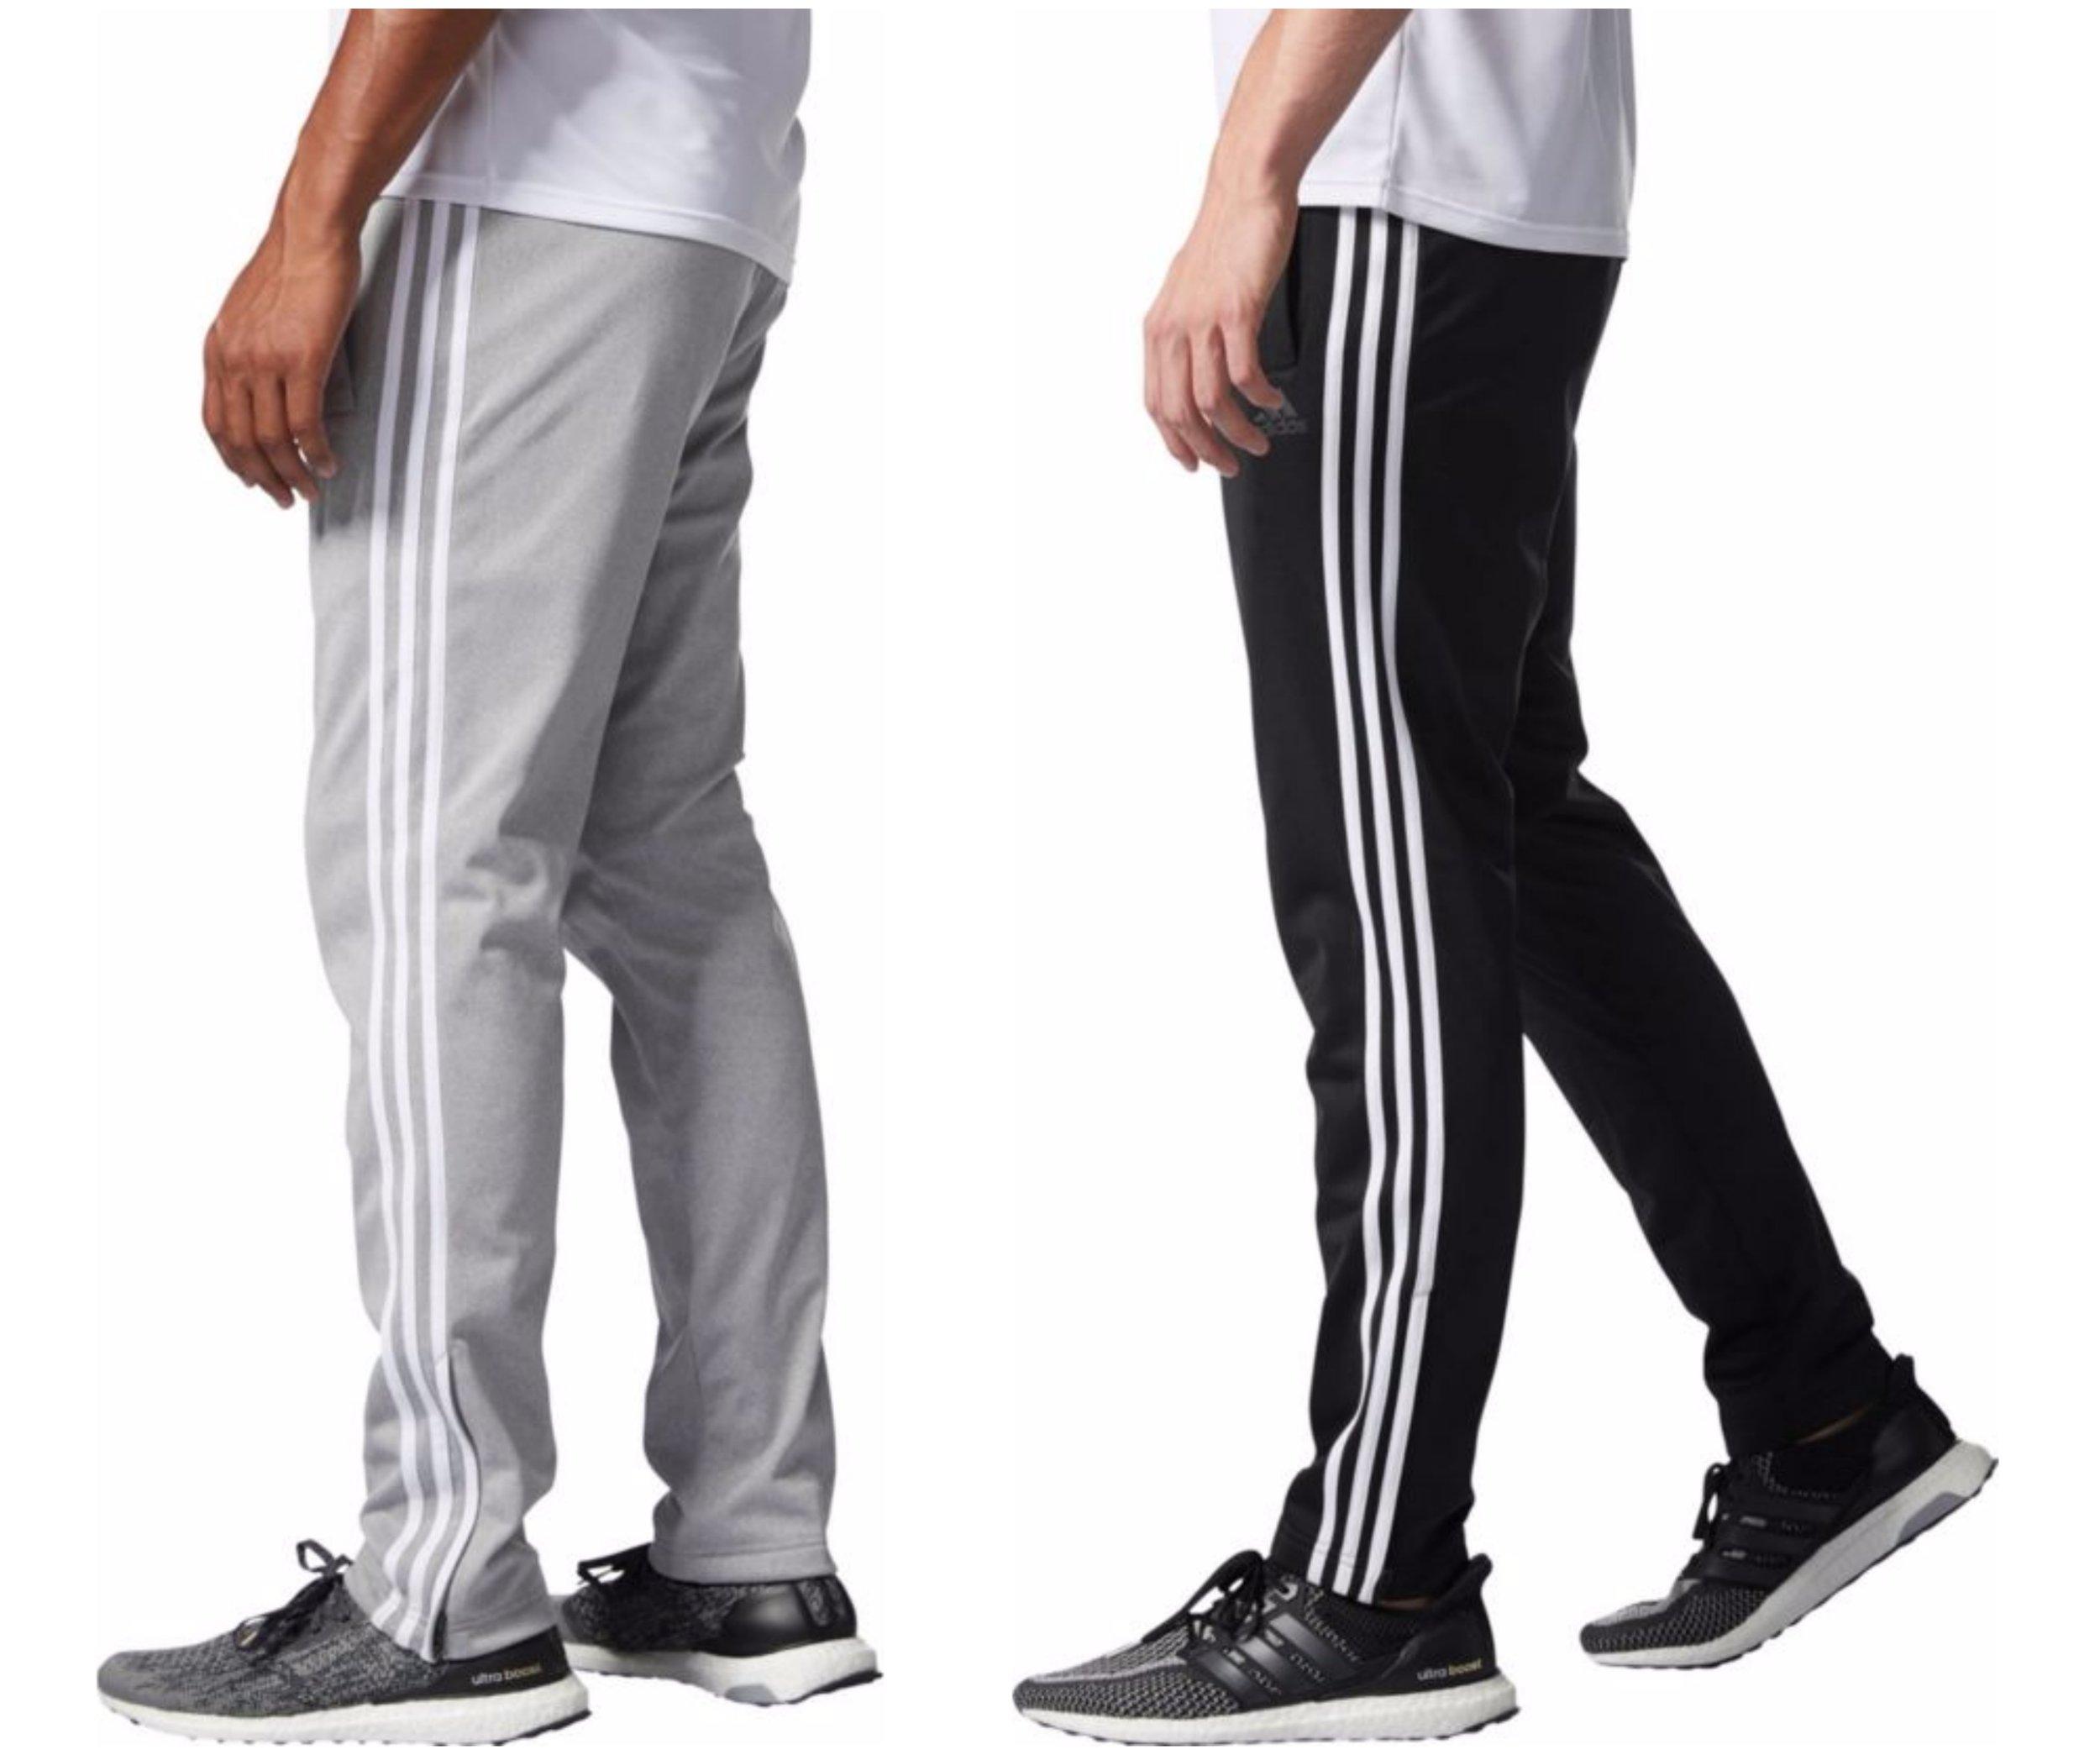 3 stripes adidas pants